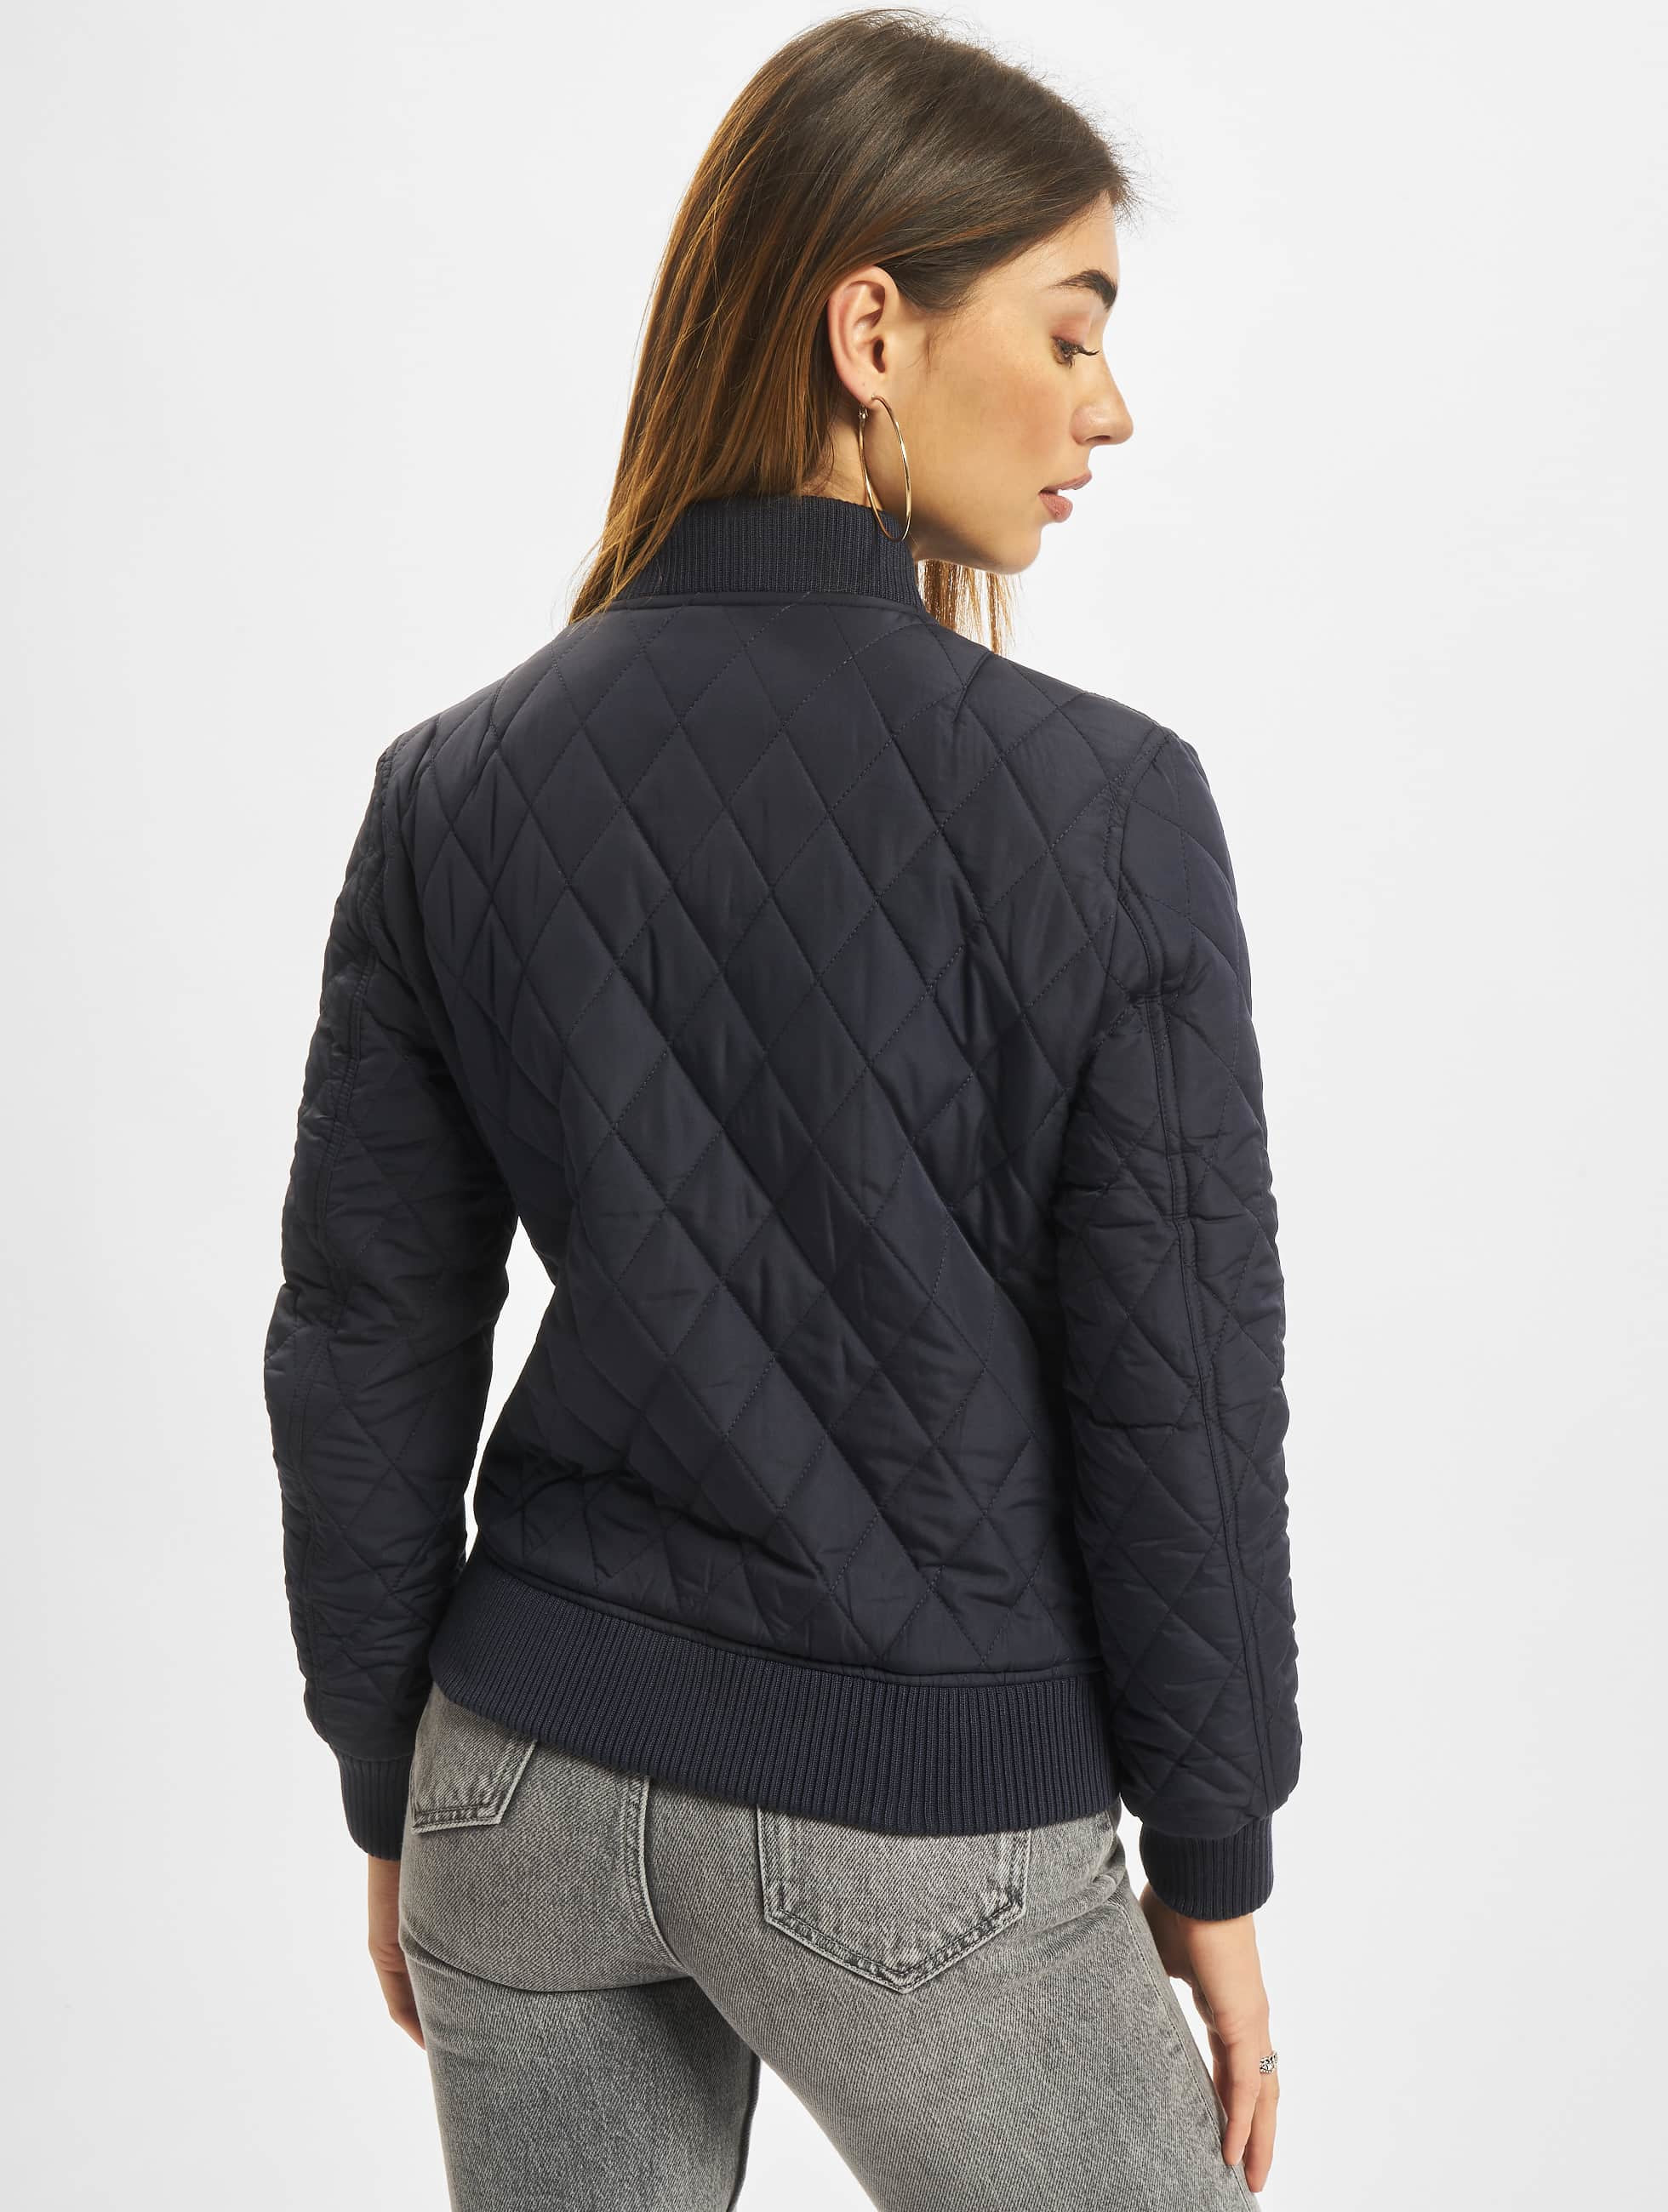 Urban Classics College Jacke Diamond Quilt Nylon blau